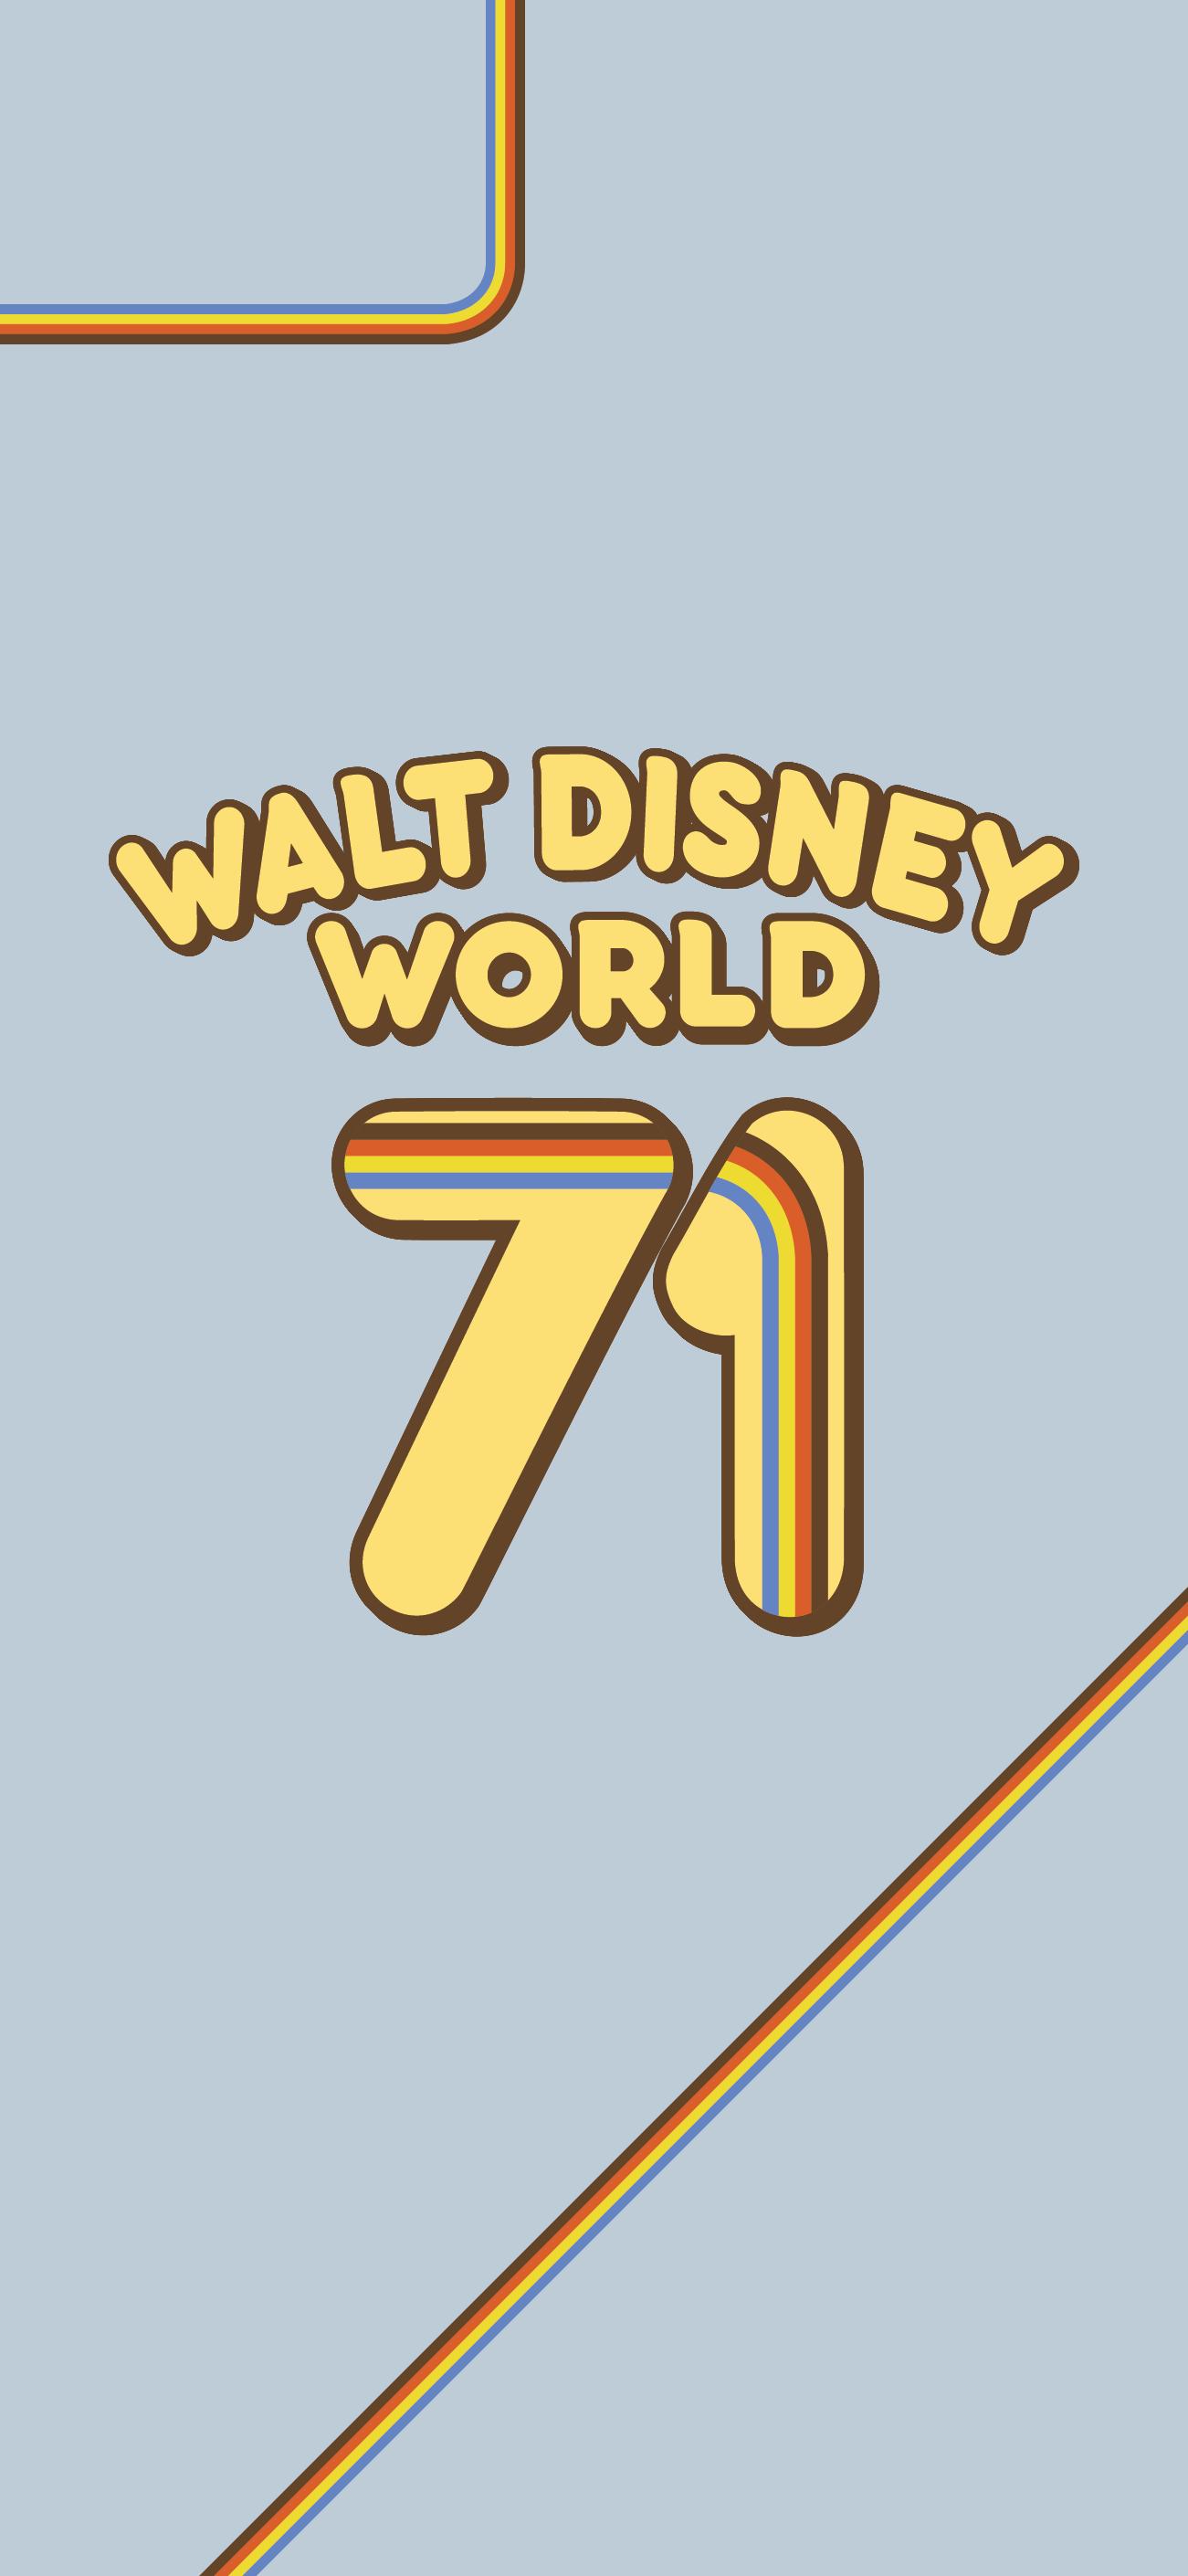 Vintage Disney Wallpaper 1301x2820 Download Hd Wallpaper Wallpapertip